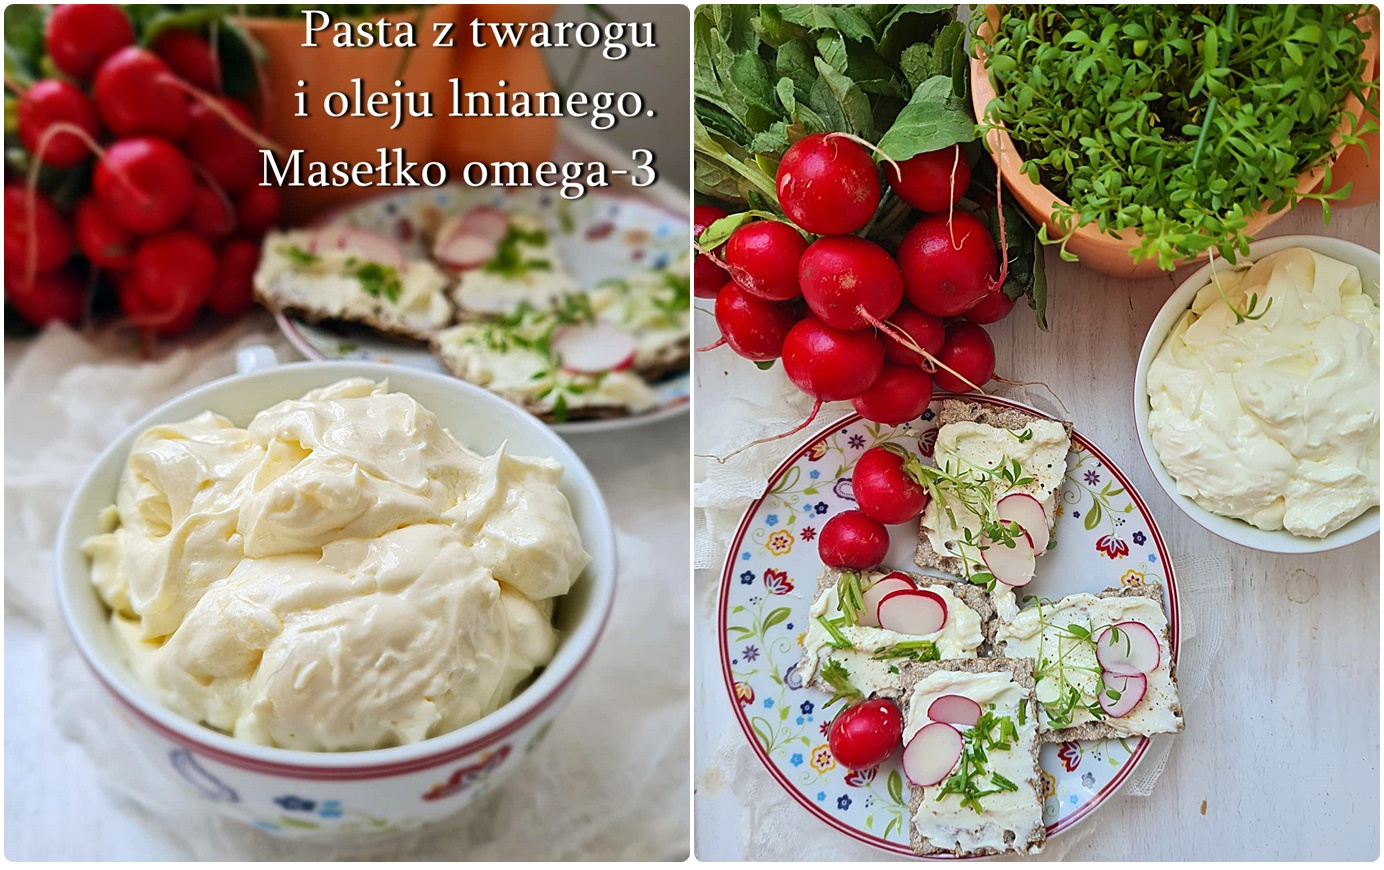 masełko omega-3